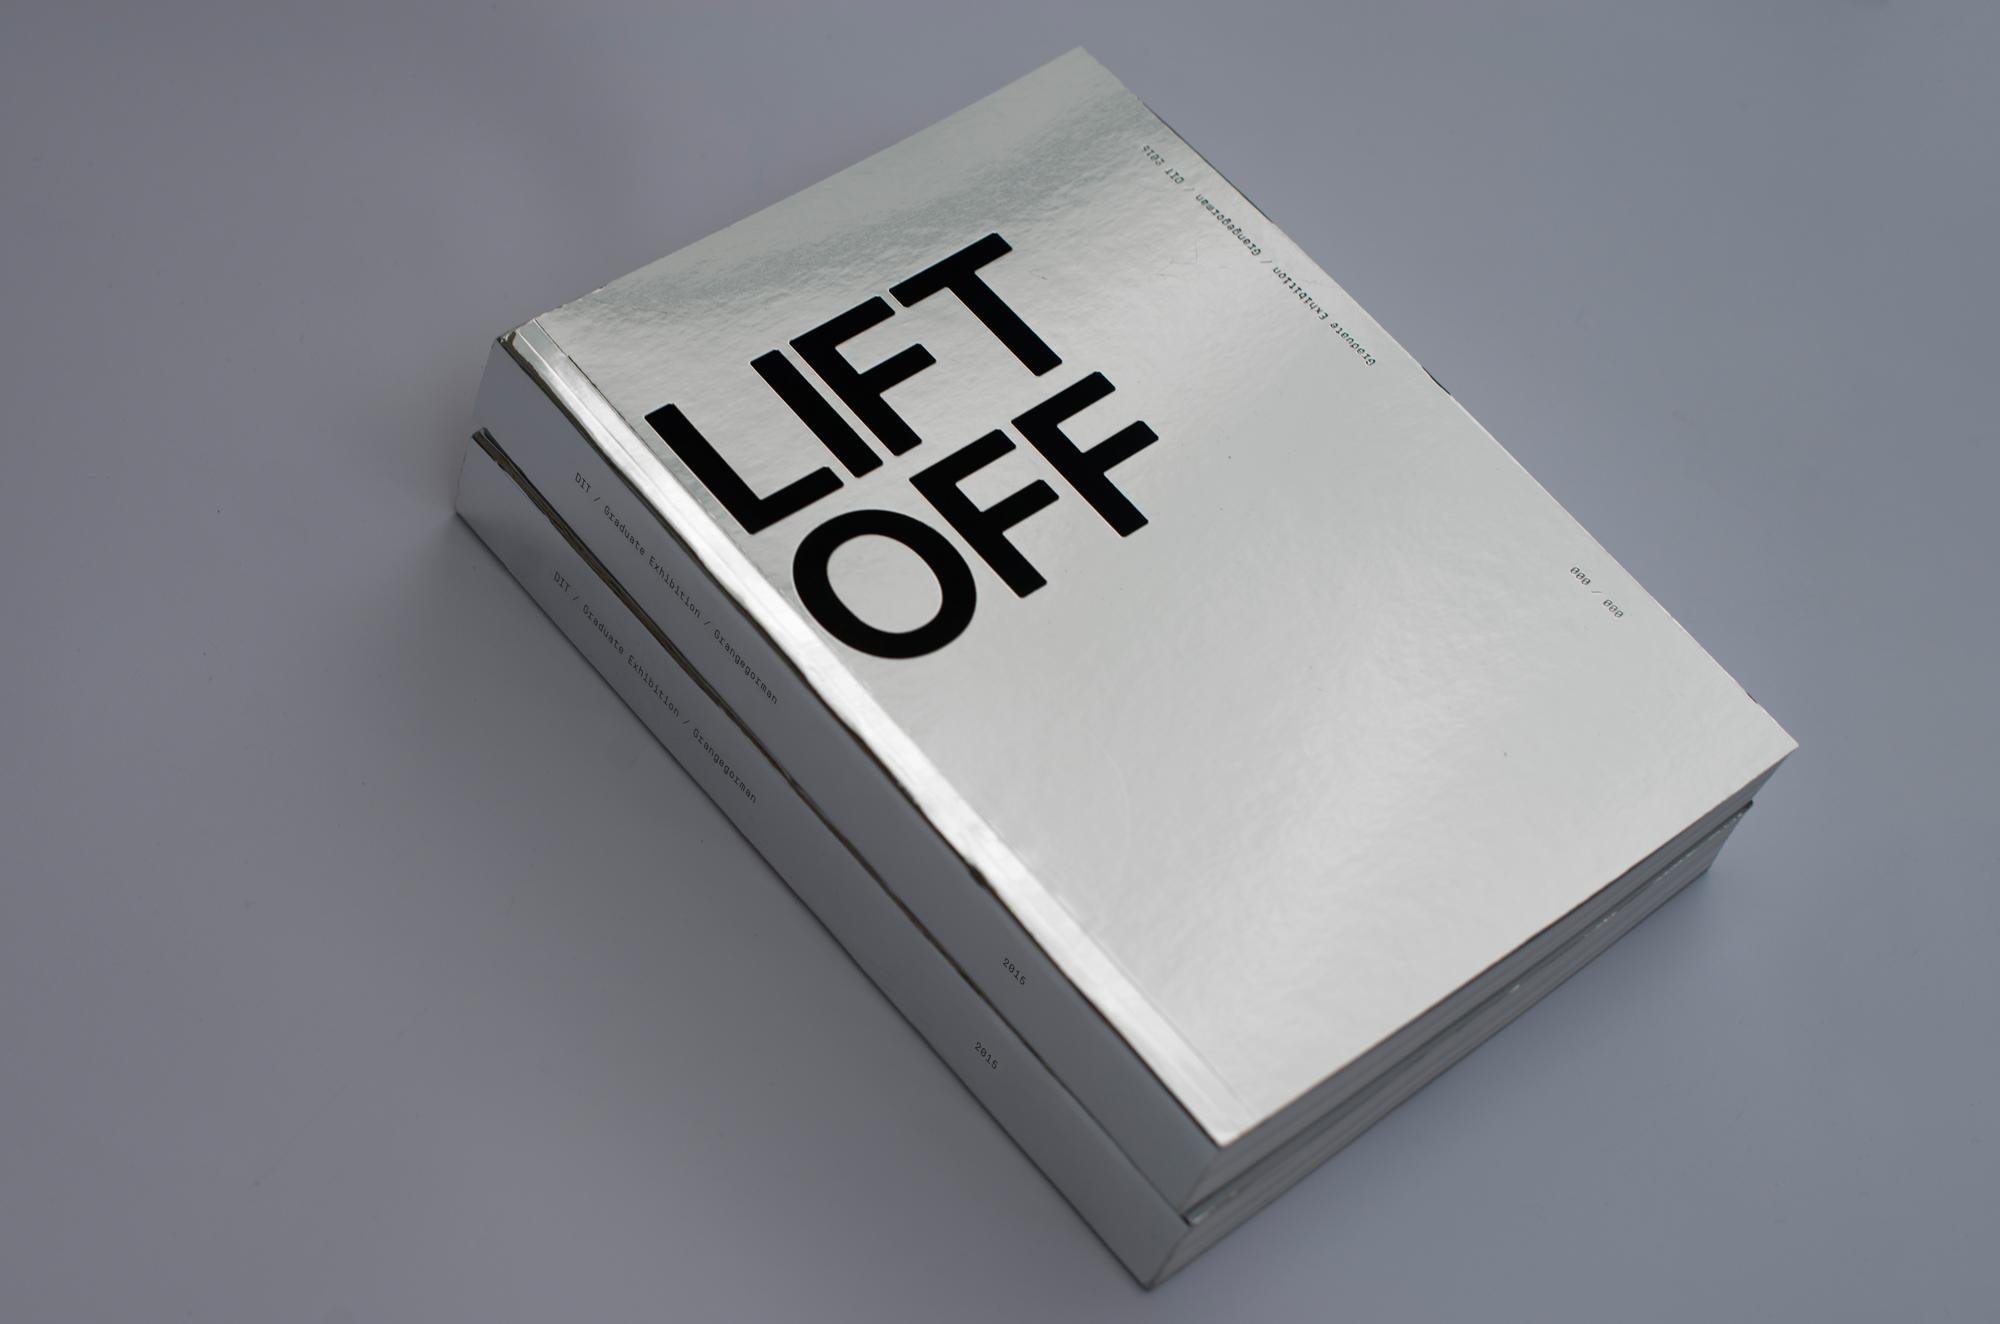 Cover image: LIFT OFF – DIT Graduate Exhibition 2015